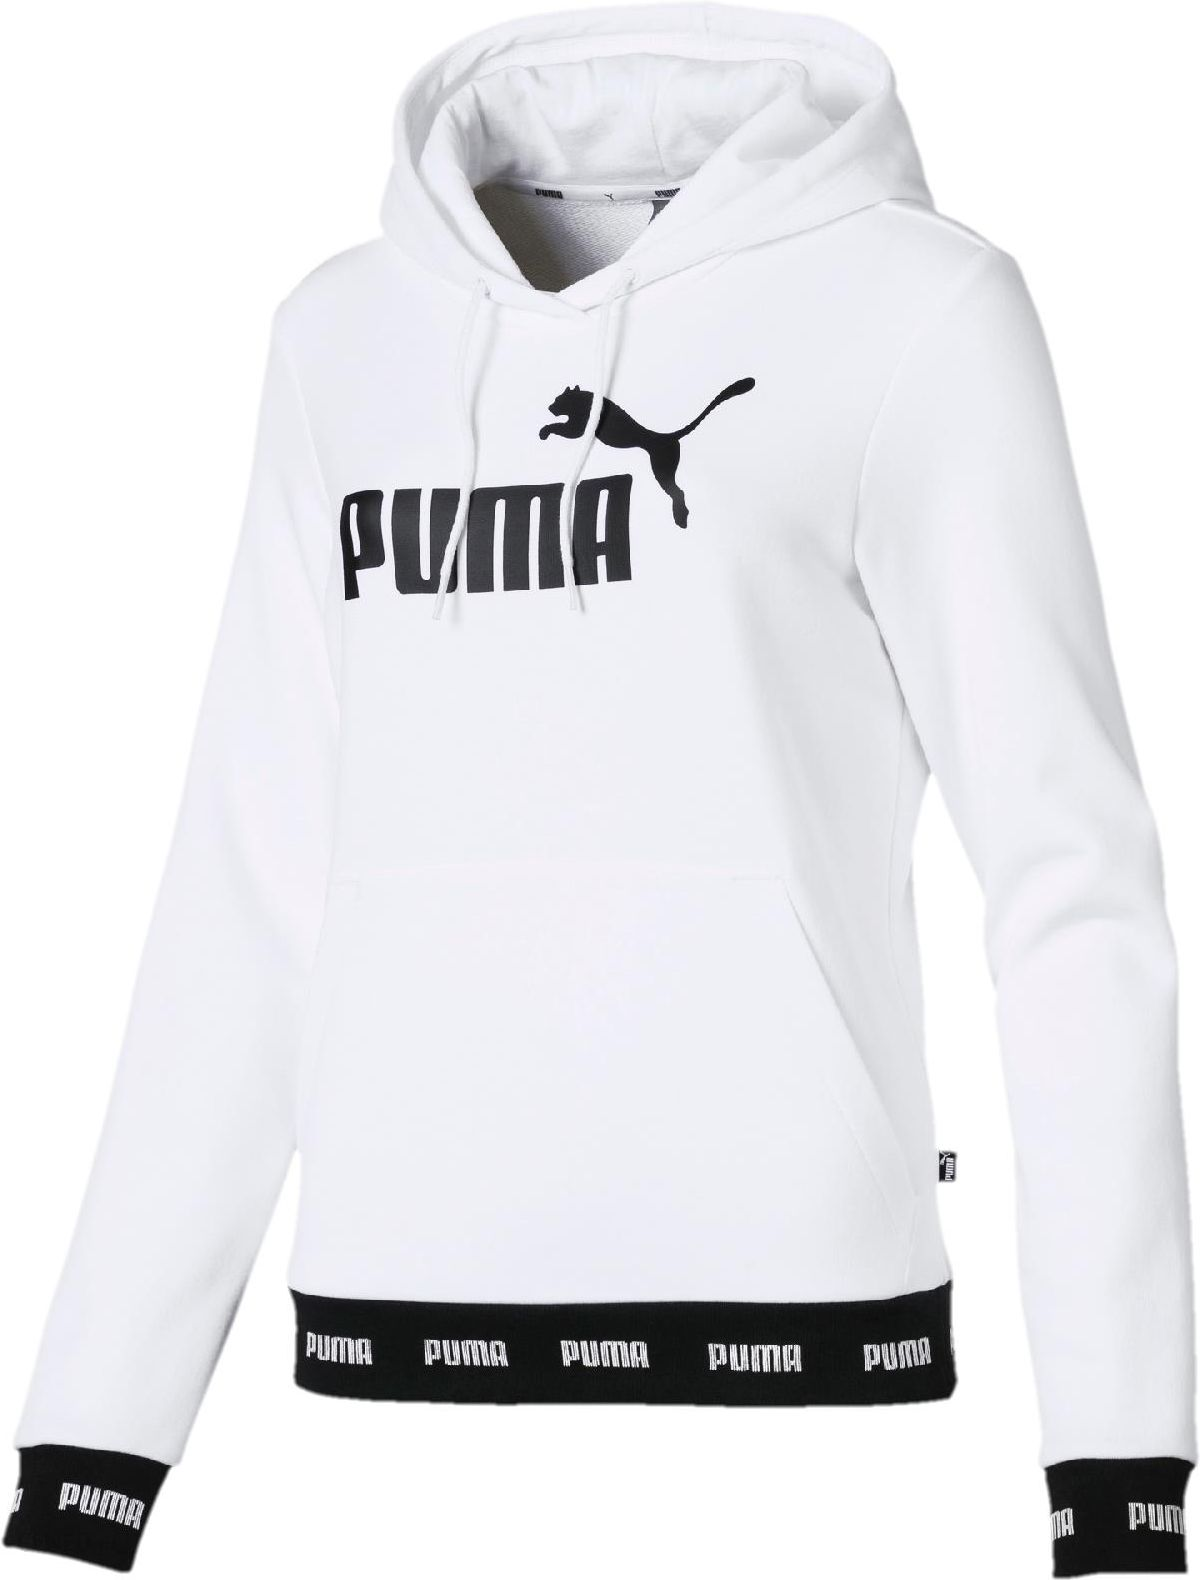 Popularne Bluza z kapturem Puma Heart T7 damska Czarny